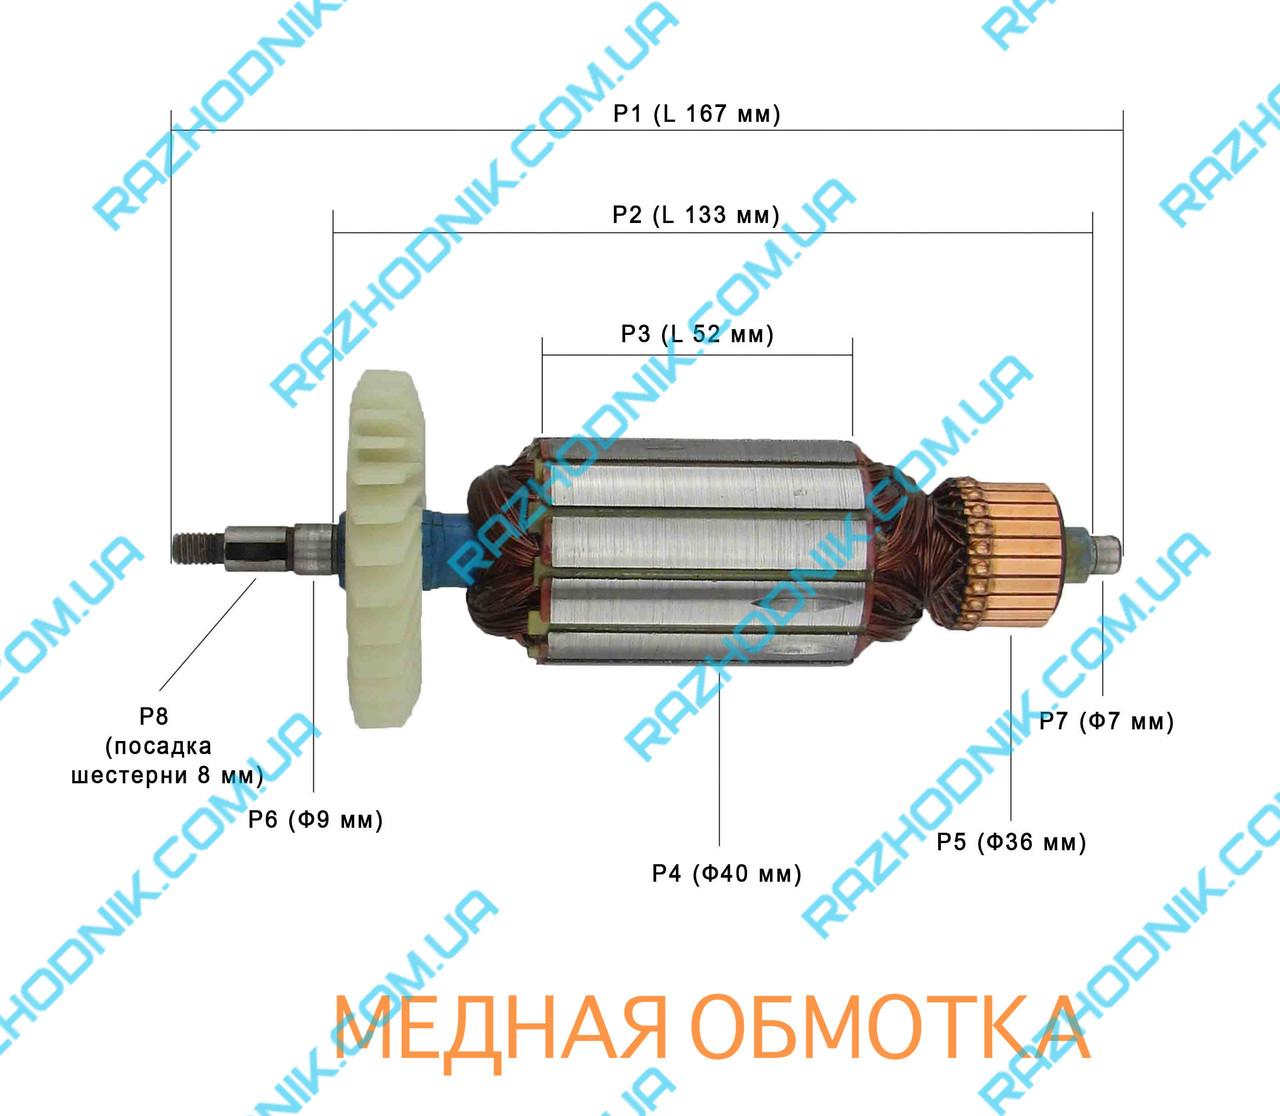 Якорь на болгарку ODWERK BWS 125-1150 (167x40)